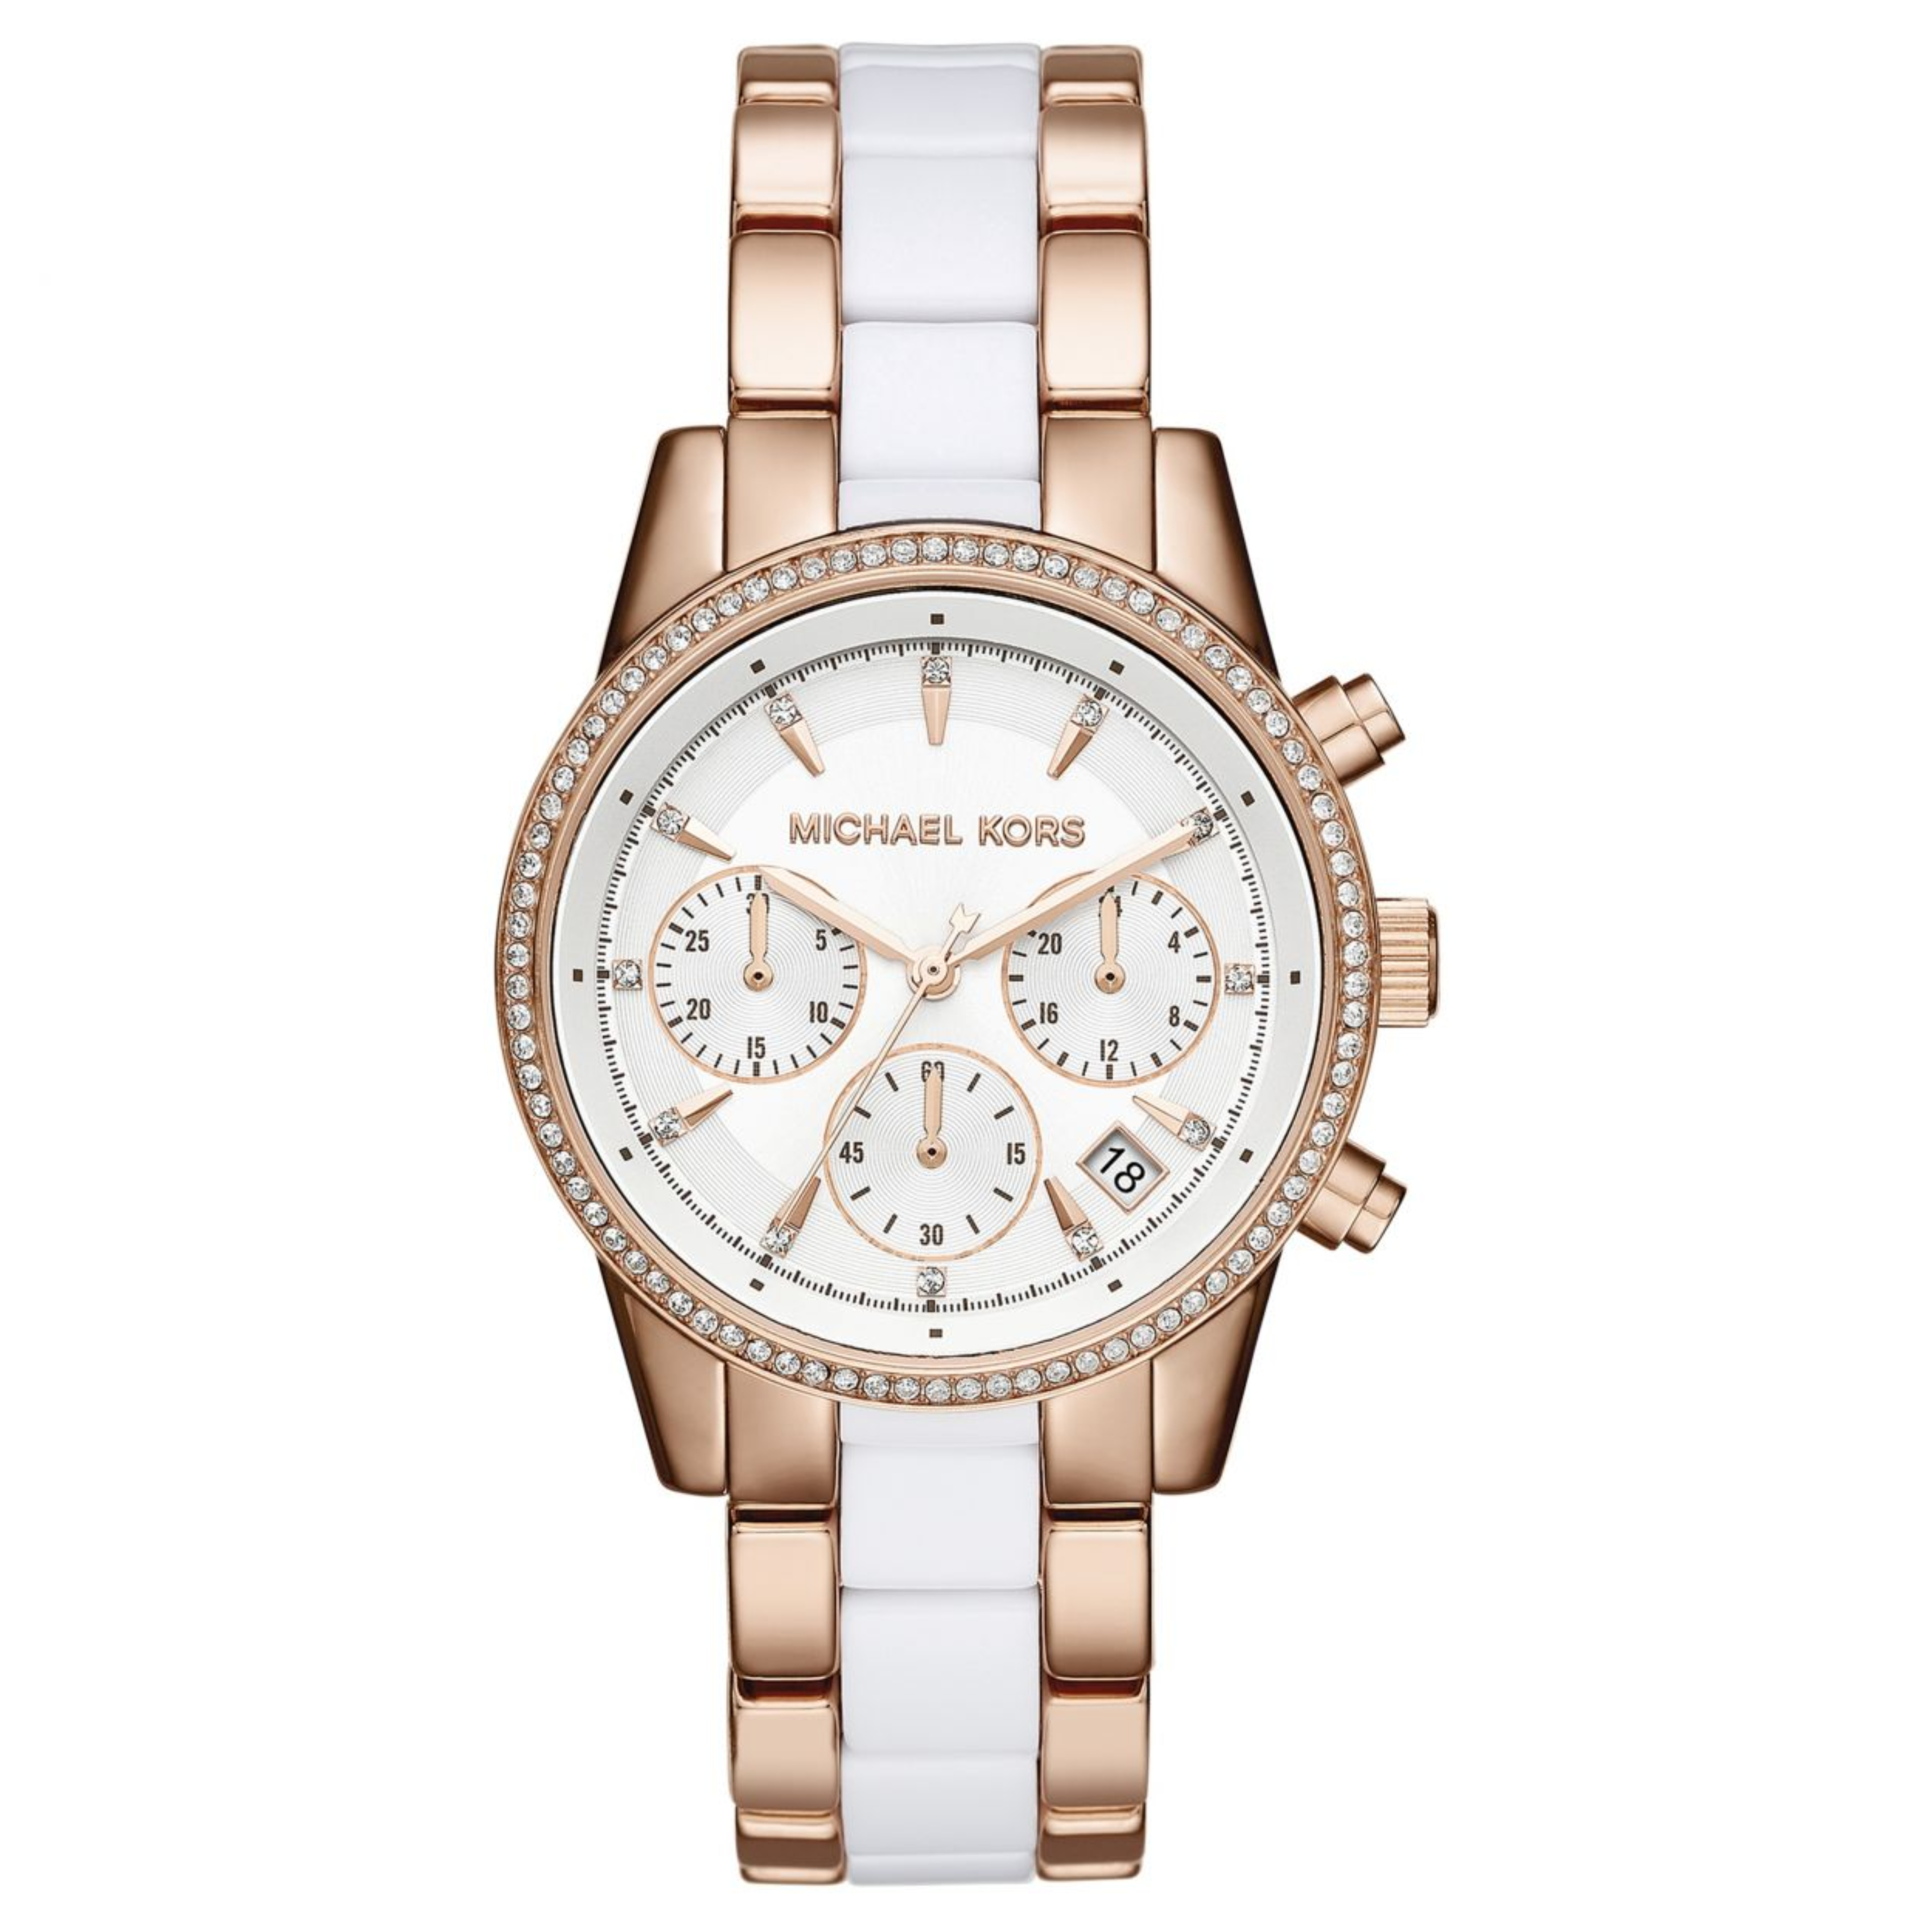 Michael Kors Ritz Ladies' Watch|Chronograph White Round Dial|Dual Tone Band|6324